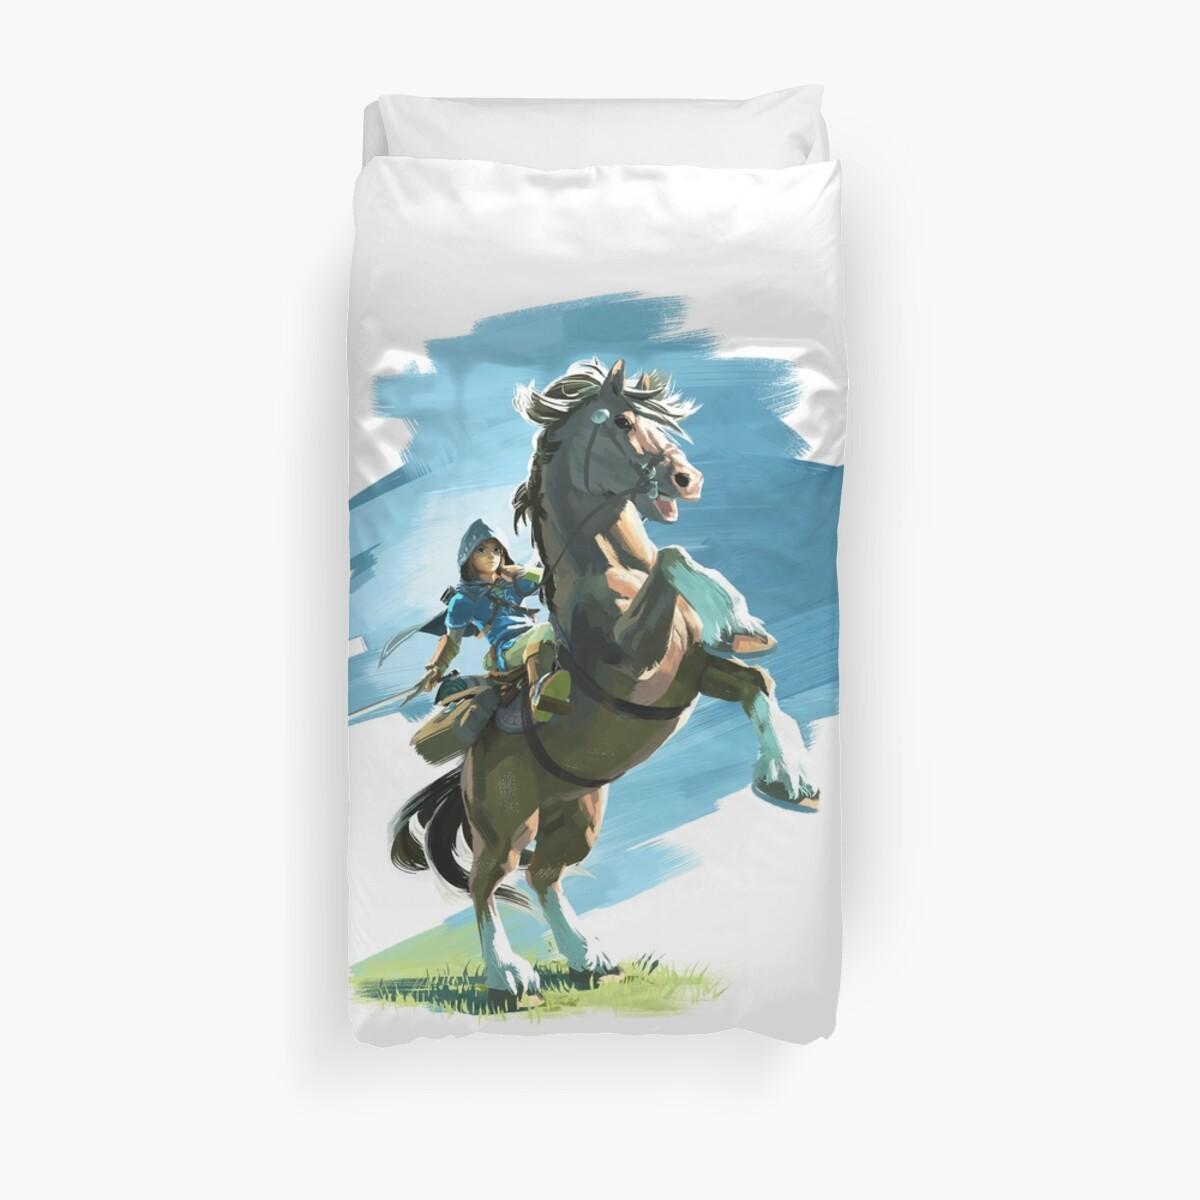 Link on Epona Legend of Zelda Breath of the Wild by Freeburn